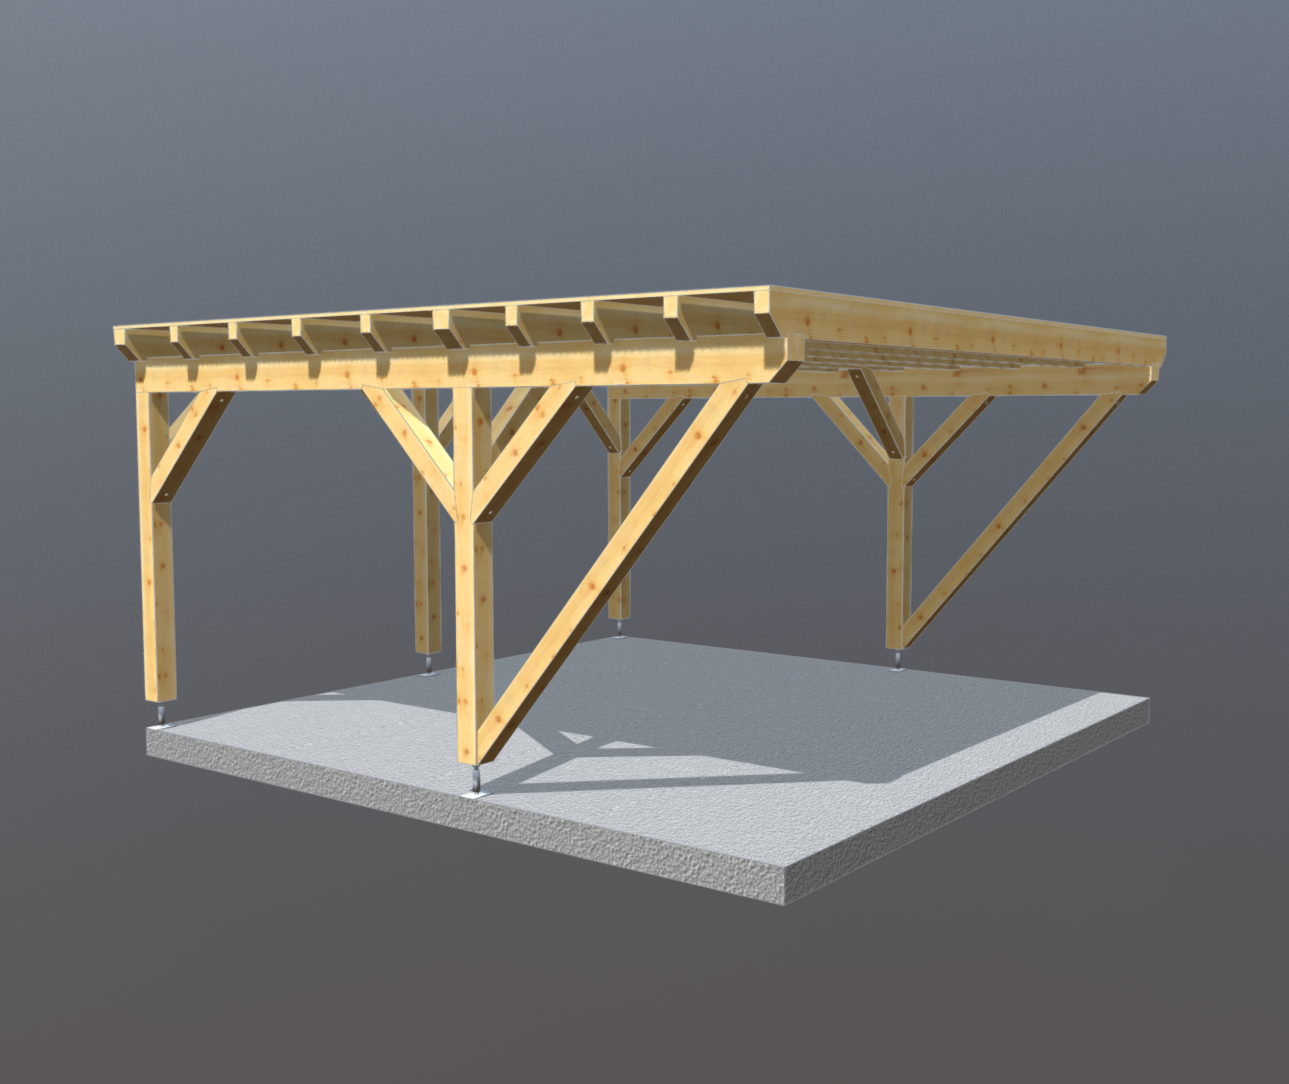 Holz carport 5m x 5m flachdach, carports aus polen